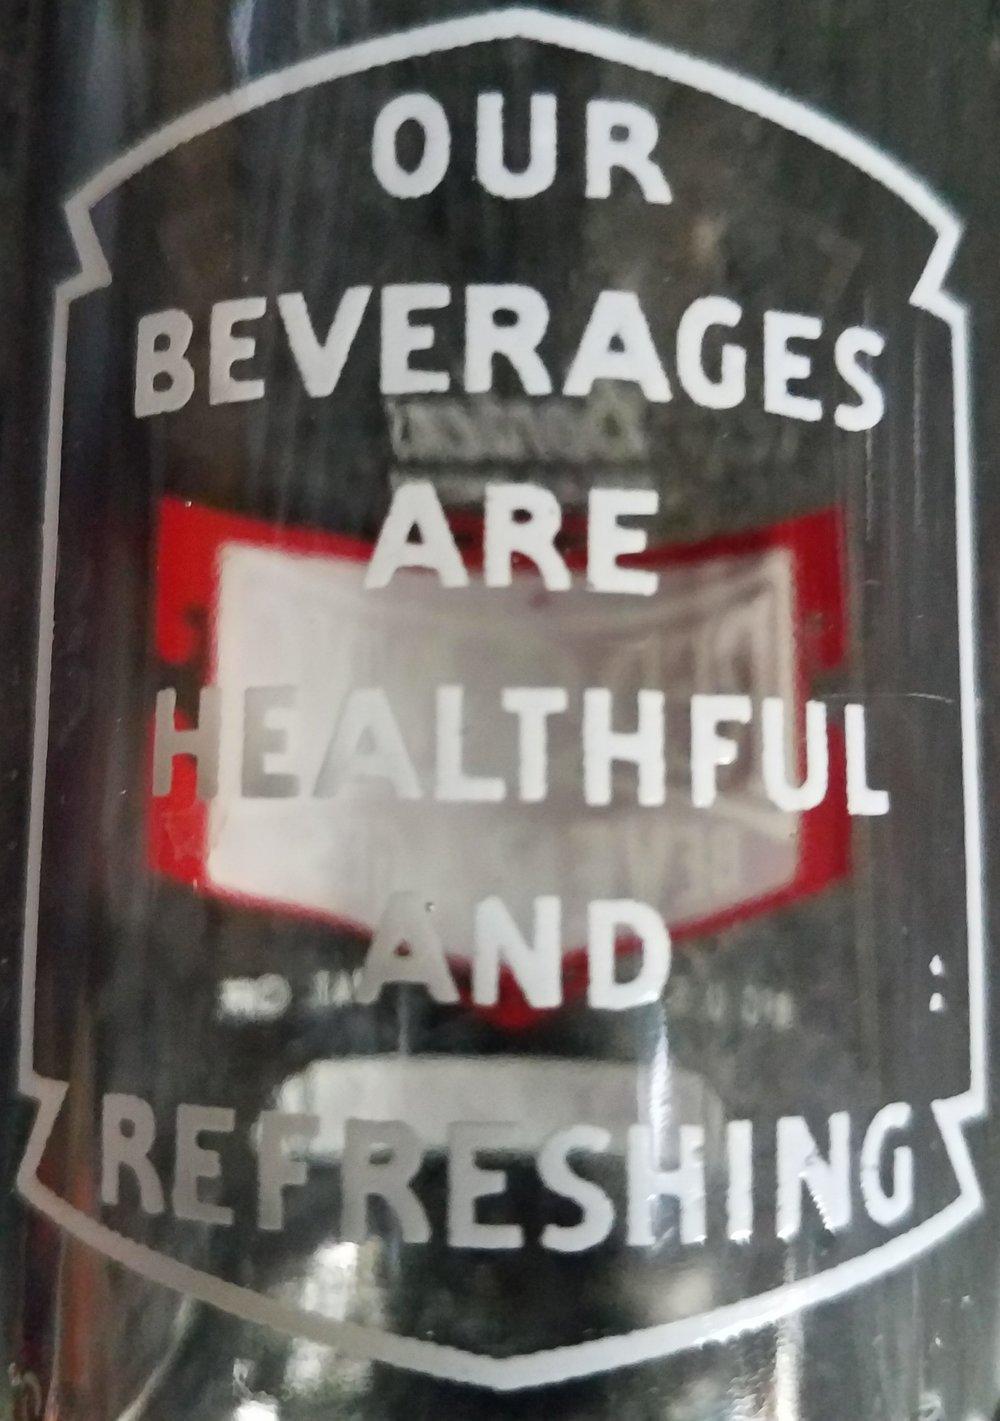 Healthful and Refreshing